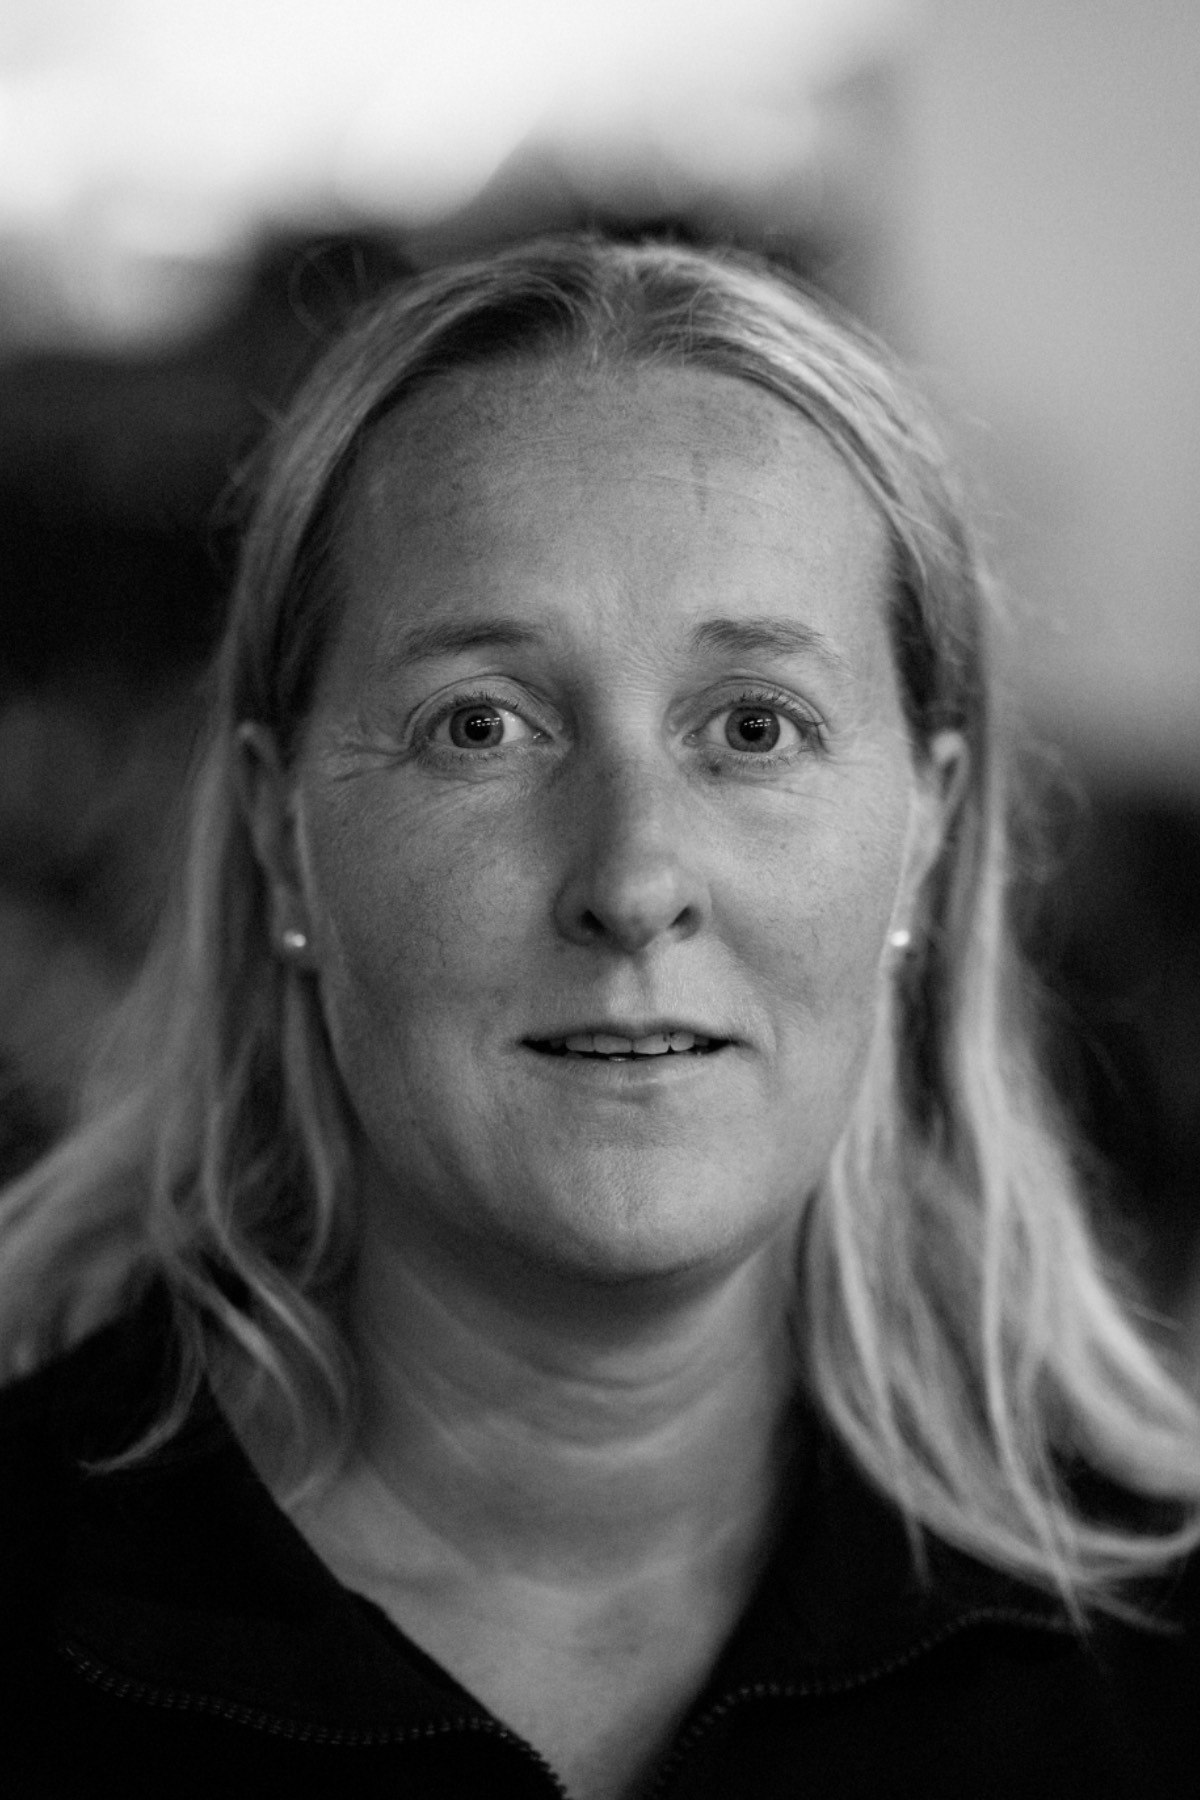 Anja Diegeler